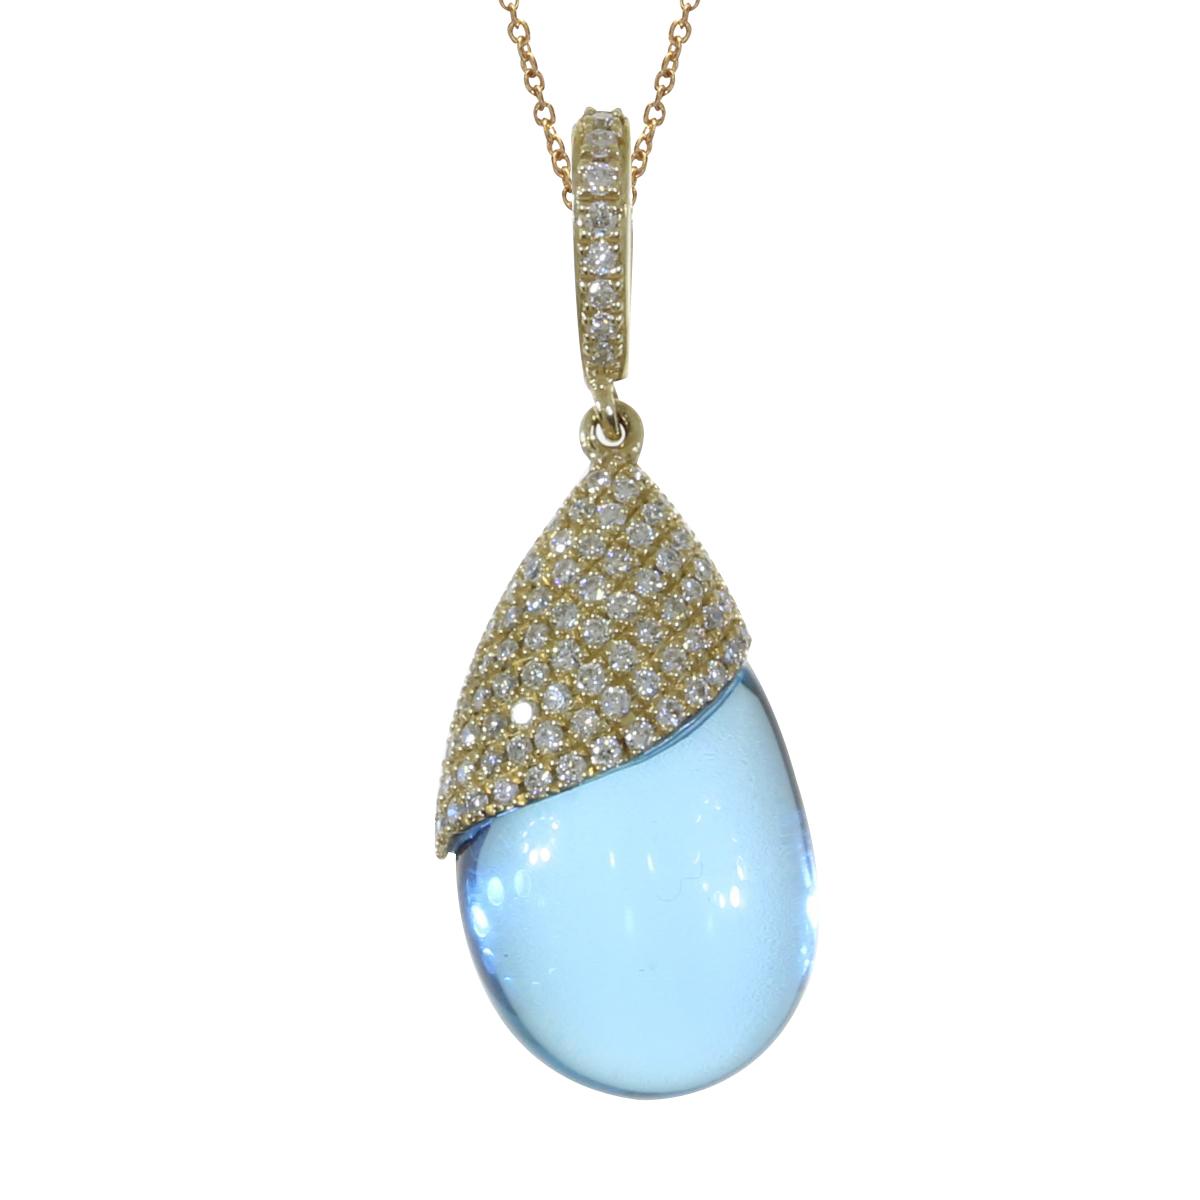 A luminous 15.8x10.3 mm cabochon blue topaz pendant topped off with .27 total carat diamonds set ...